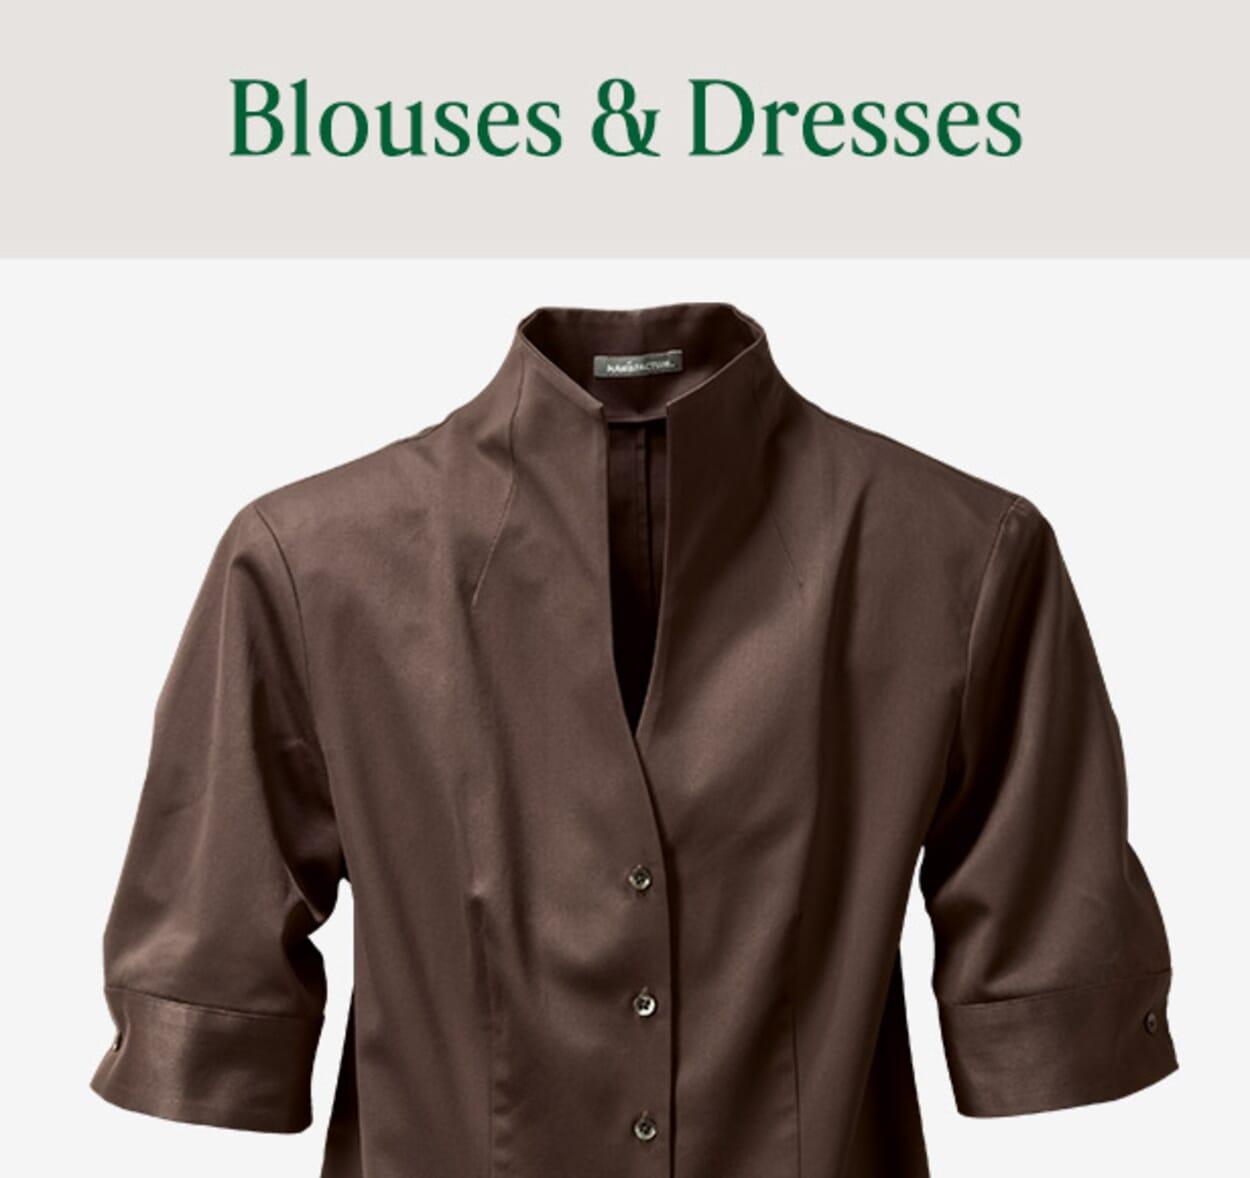 Womens Blouses & Dresses